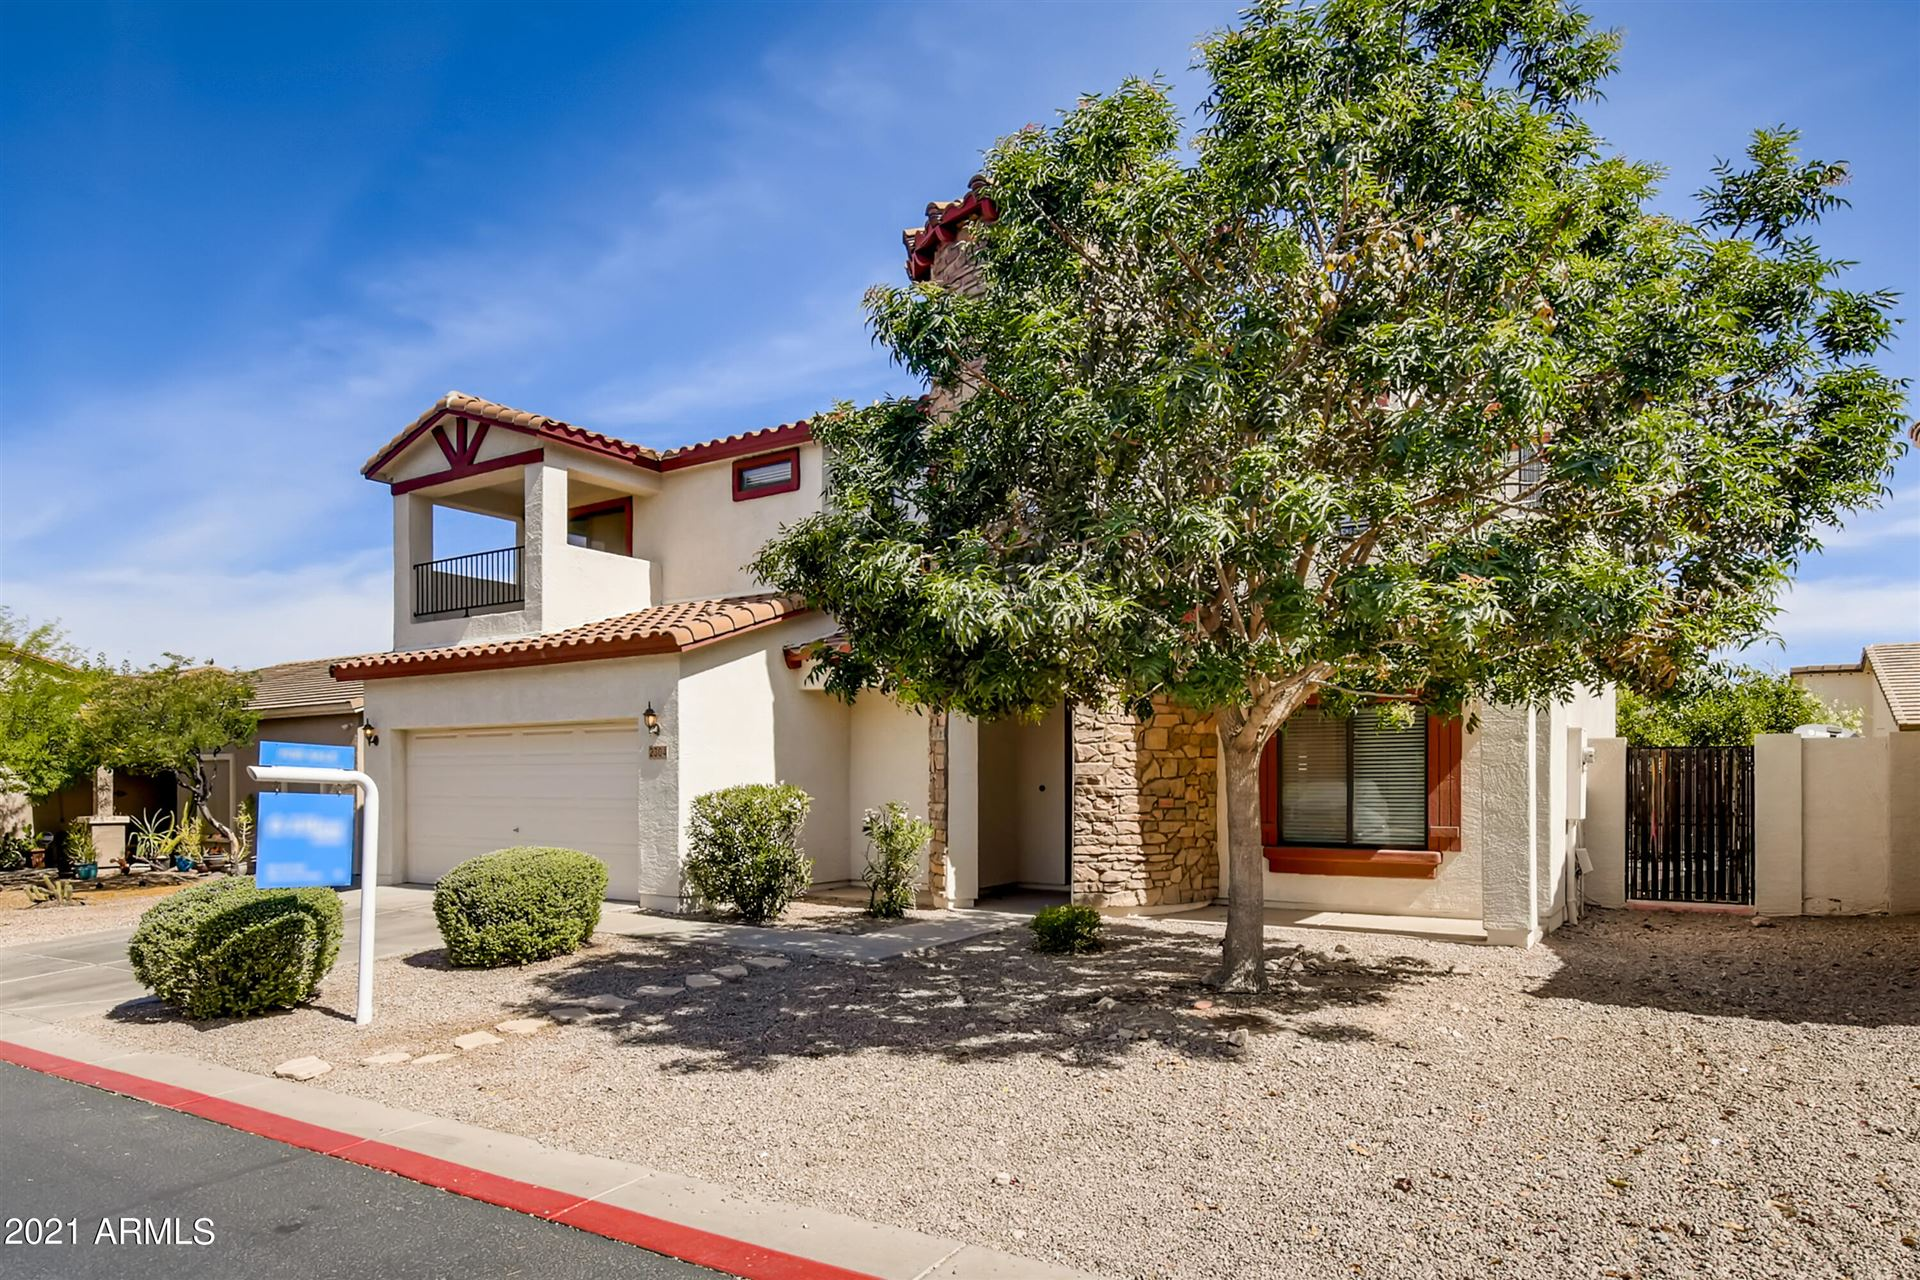 Photo of 2304 E GREENLEE Avenue, Apache Junction, AZ 85119 (MLS # 6246974)